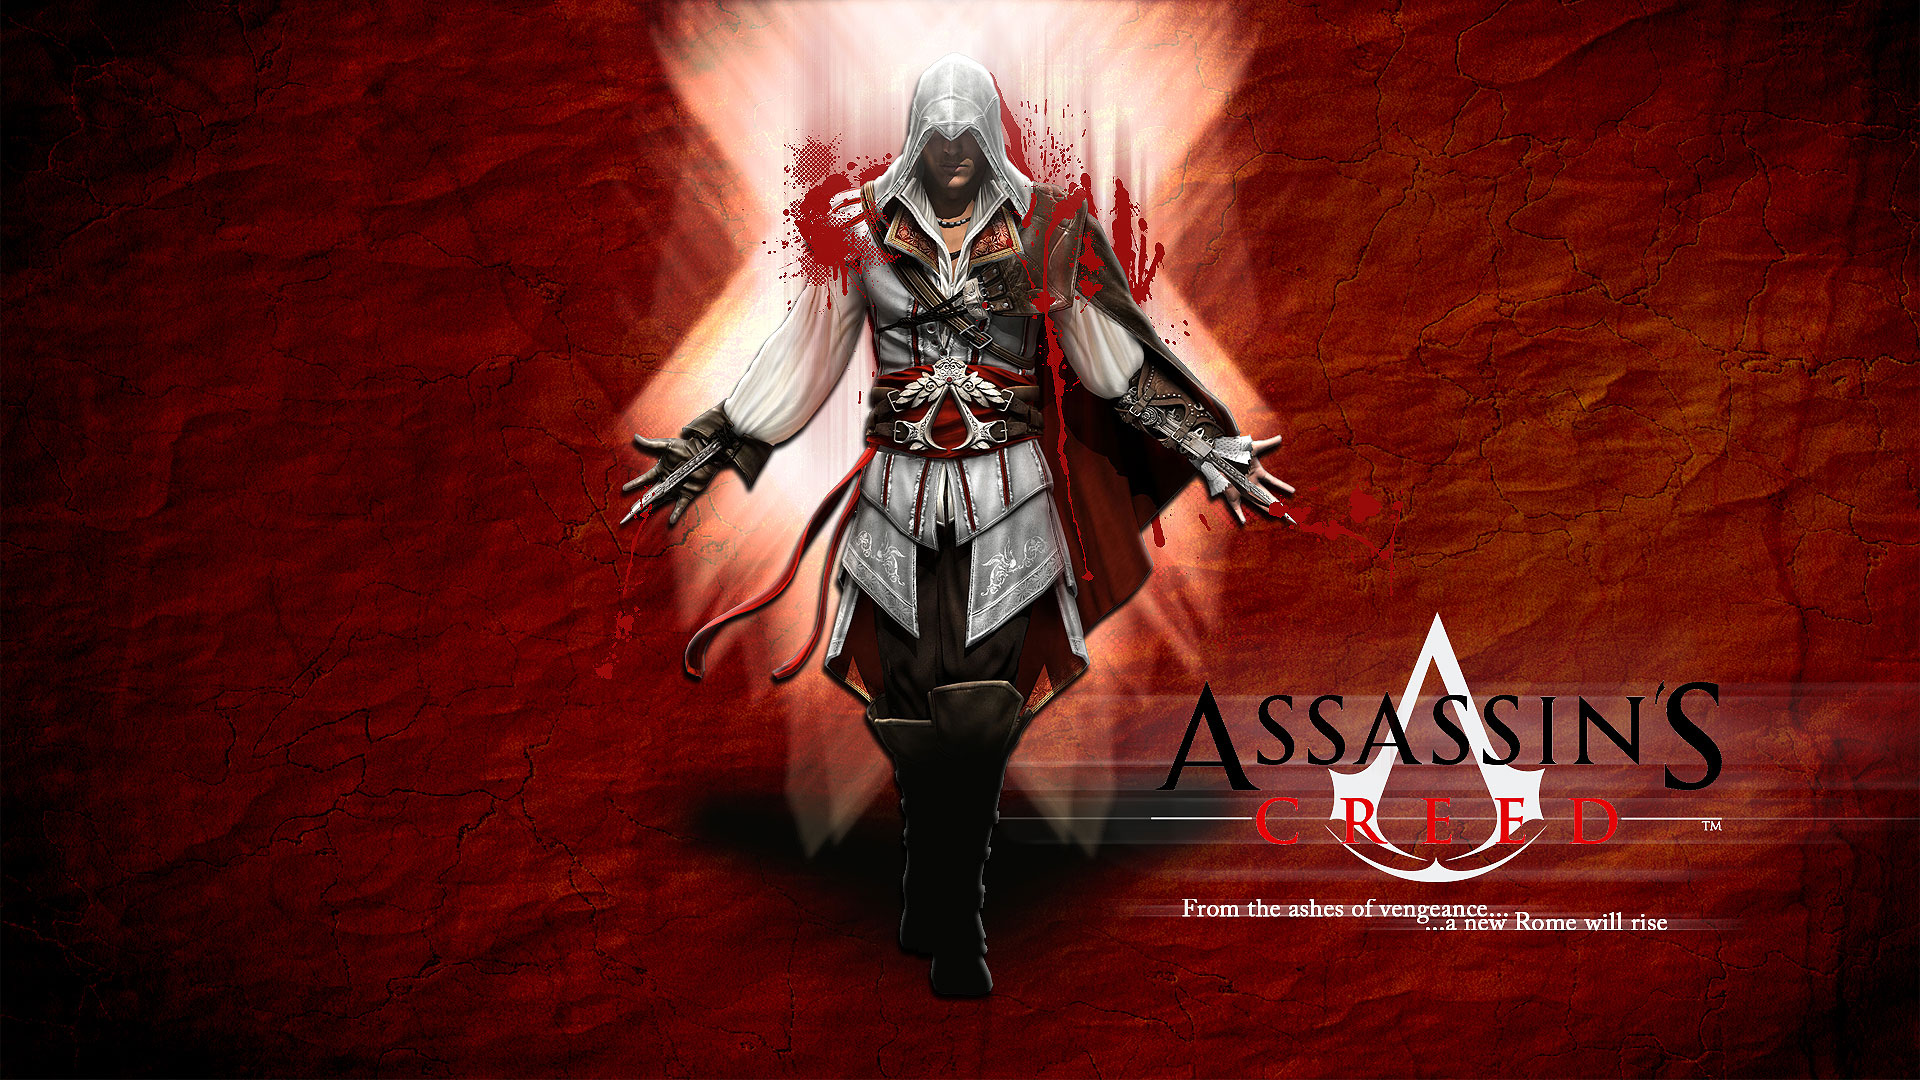 Download Assassins Creed Widescreen Wallpaper Full HD Wallpapers 1920x1080